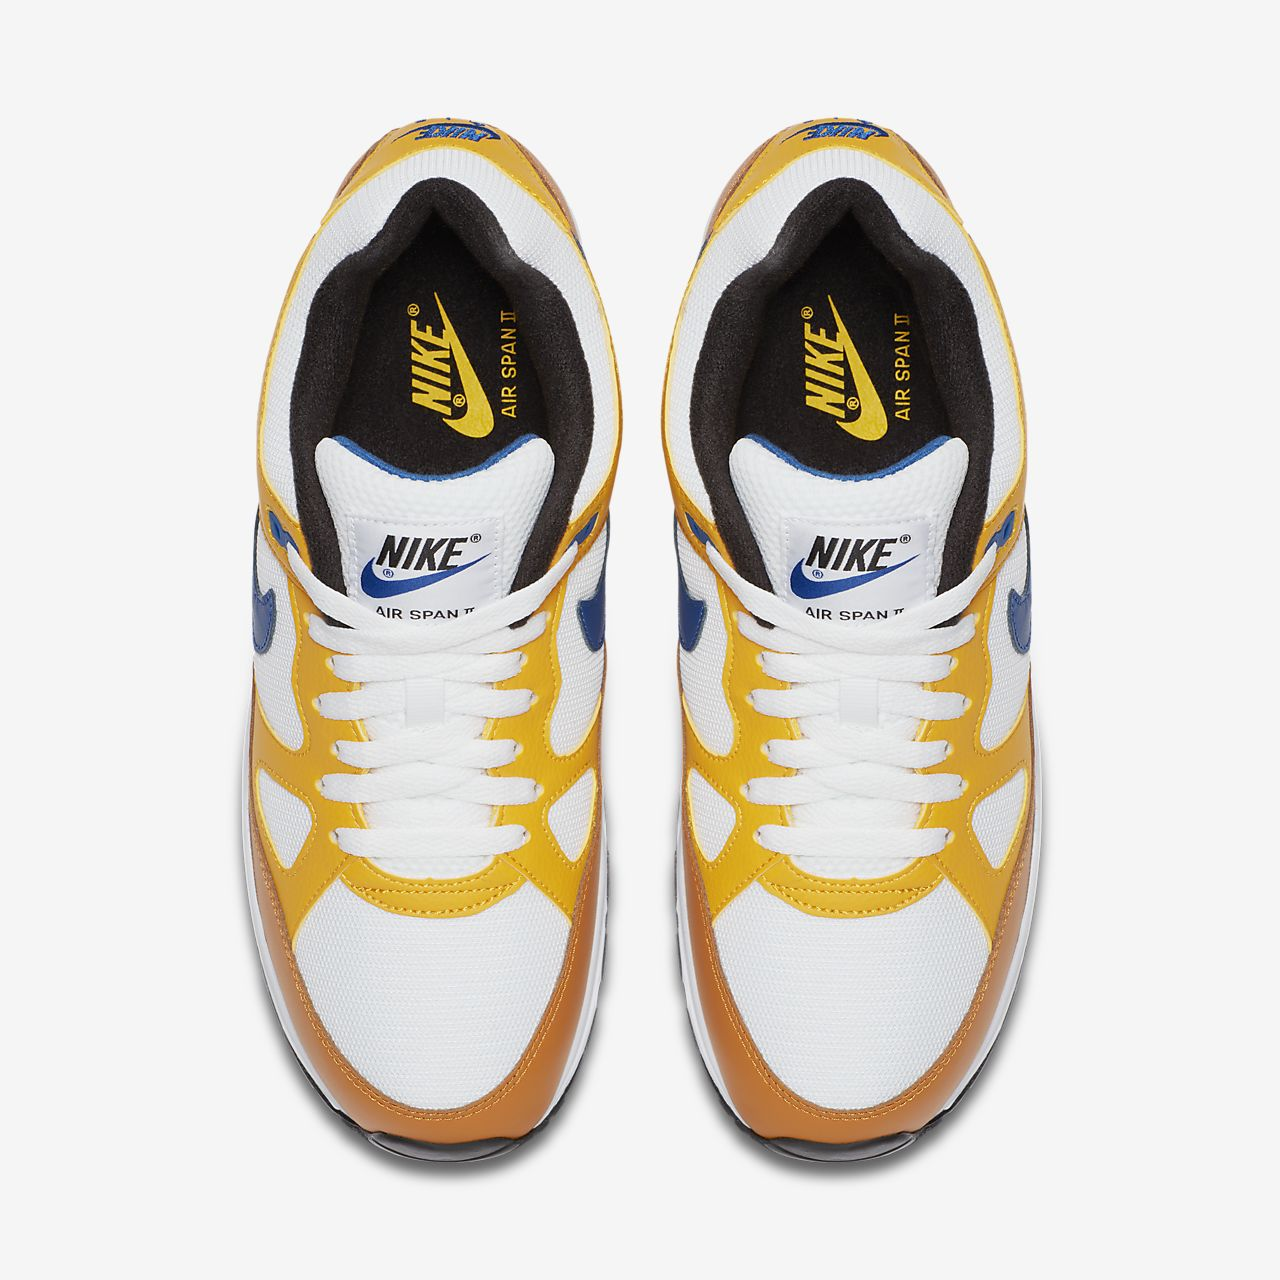 sports shoes 913a4 cc641 ... Nike Air Span II Men s Shoe